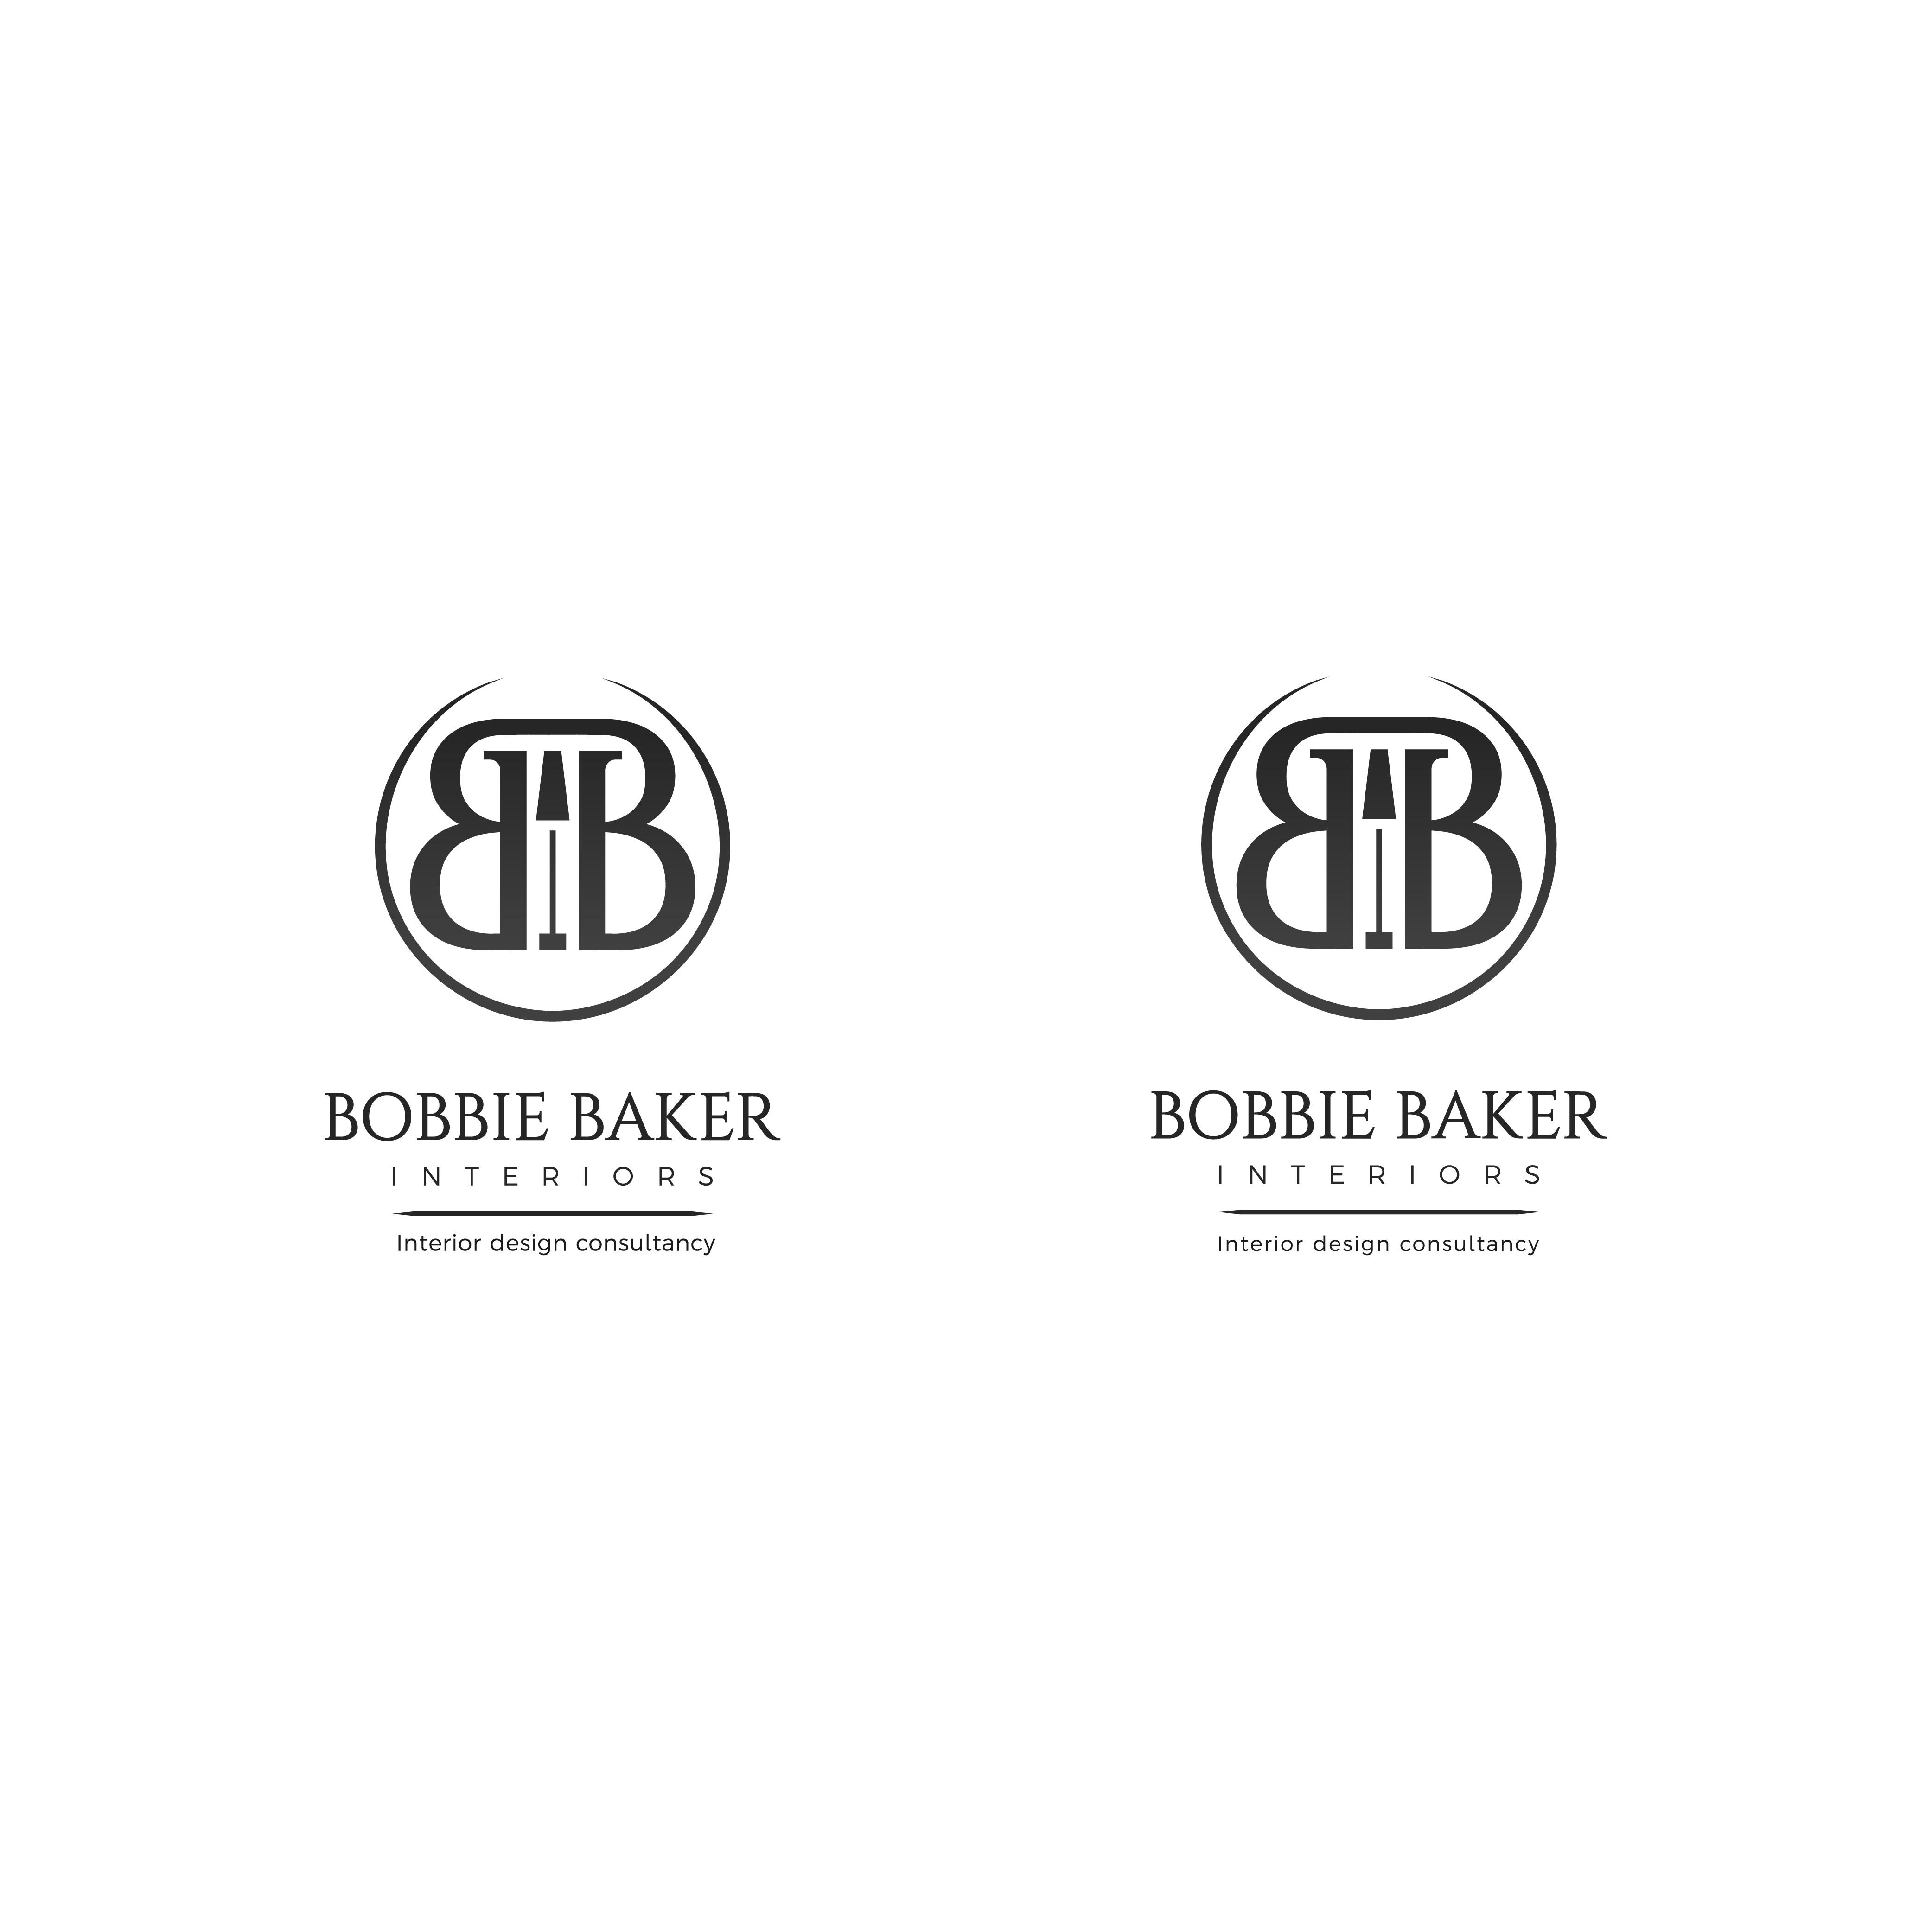 Design a sleek modern logo for interior design consultancy